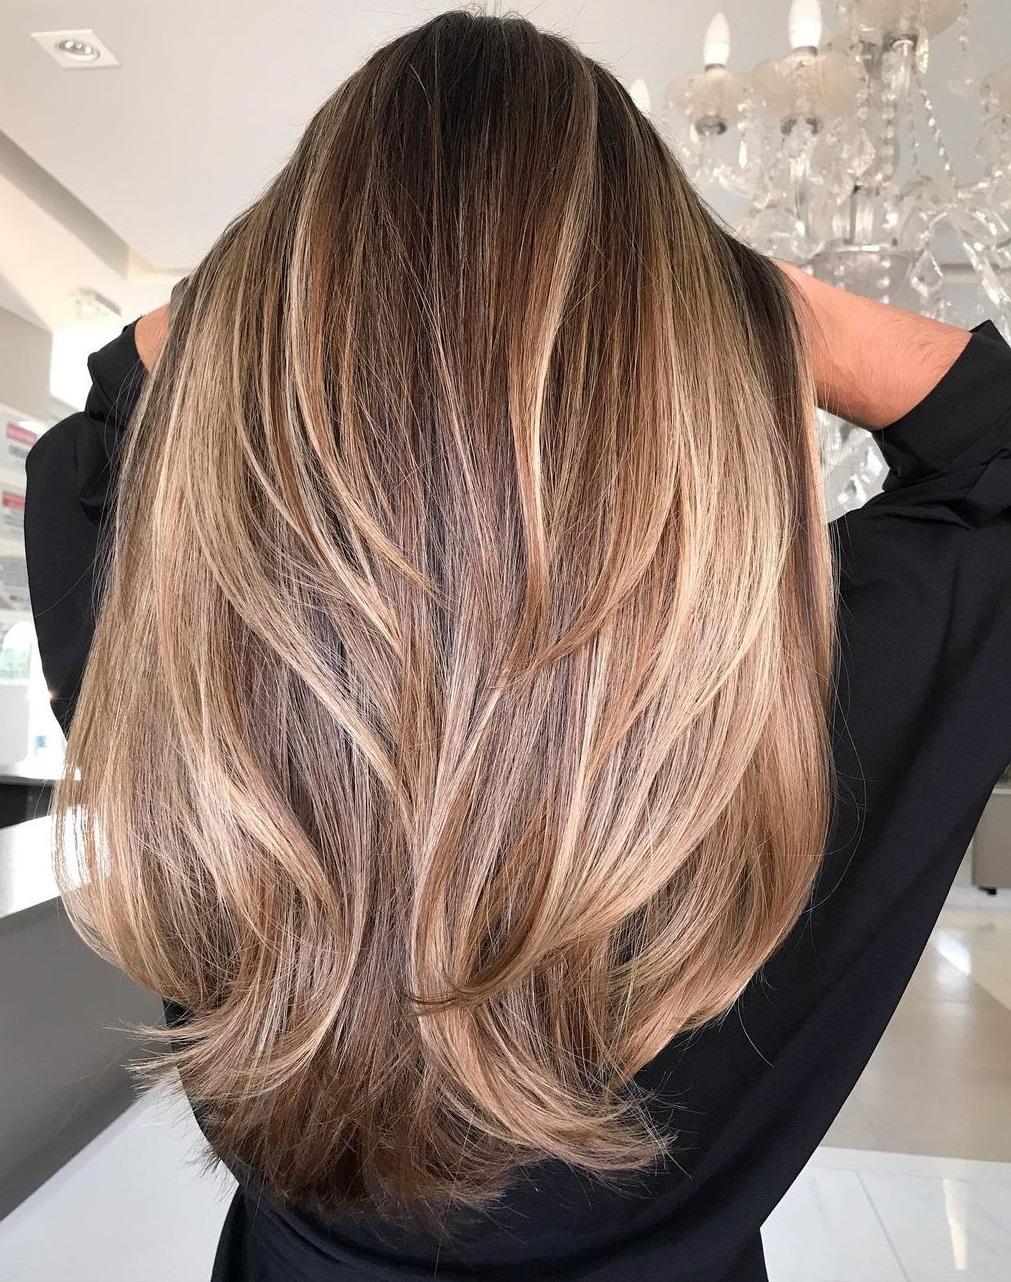 Honey Blonde Long Textured Hair